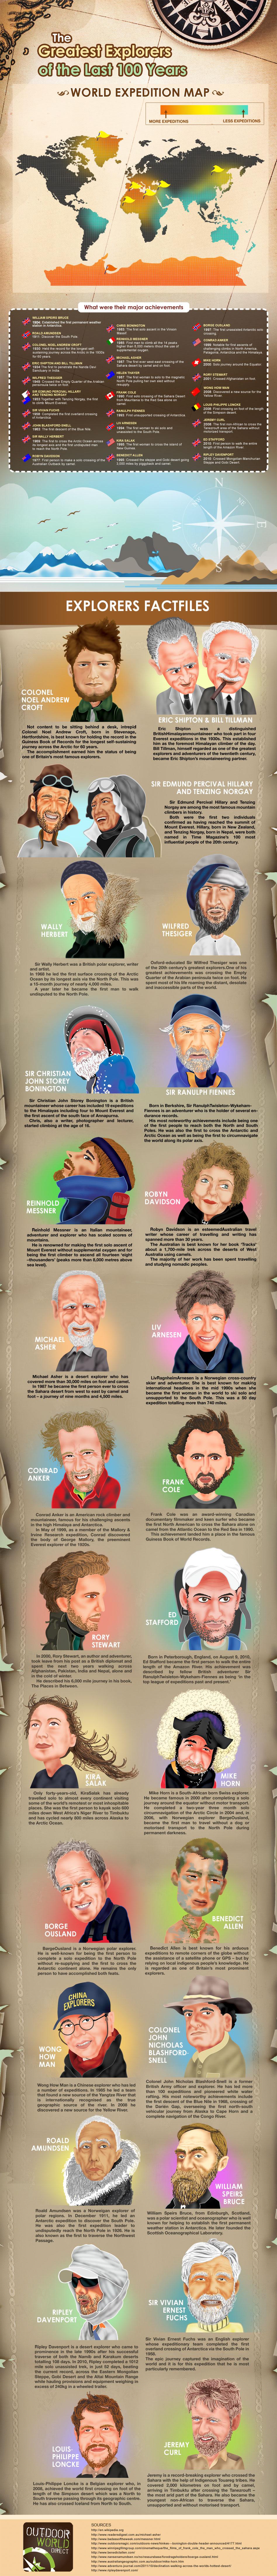 Greatest Explorers History-Infographic